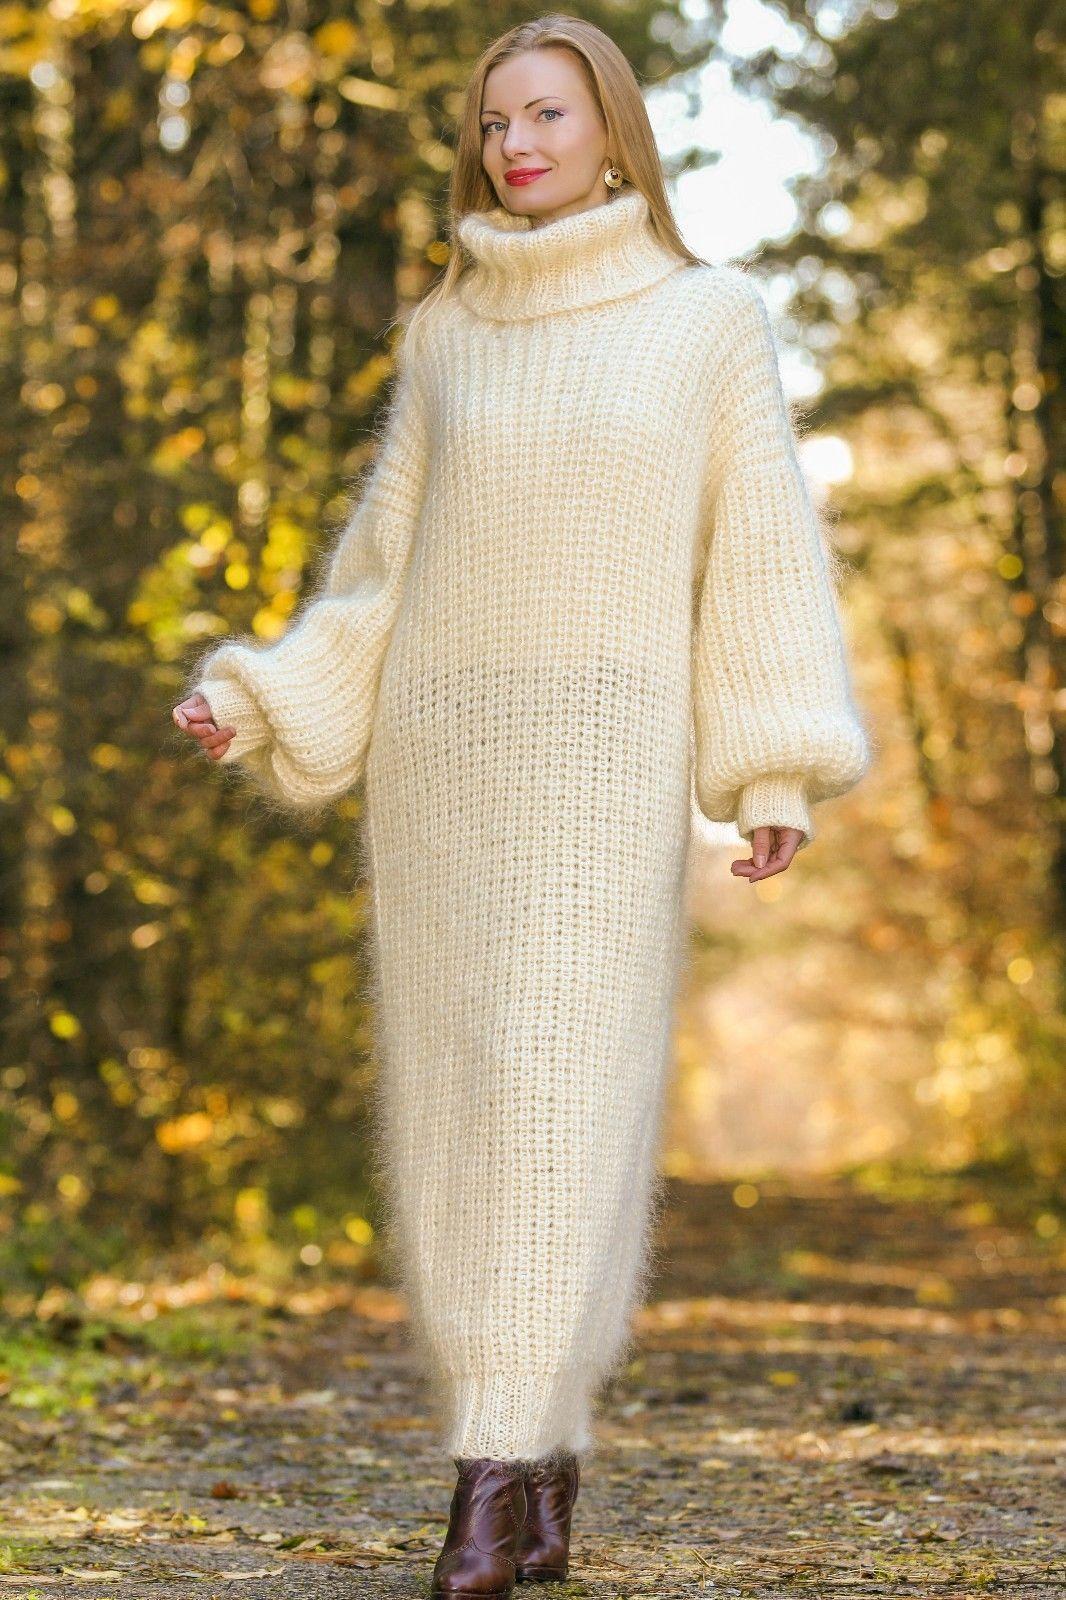 de82b3f3cea3 Supertanya Ivory Hand Knitted Mohair Sweater Slouchy Fuzzy Handmade Long  Dress